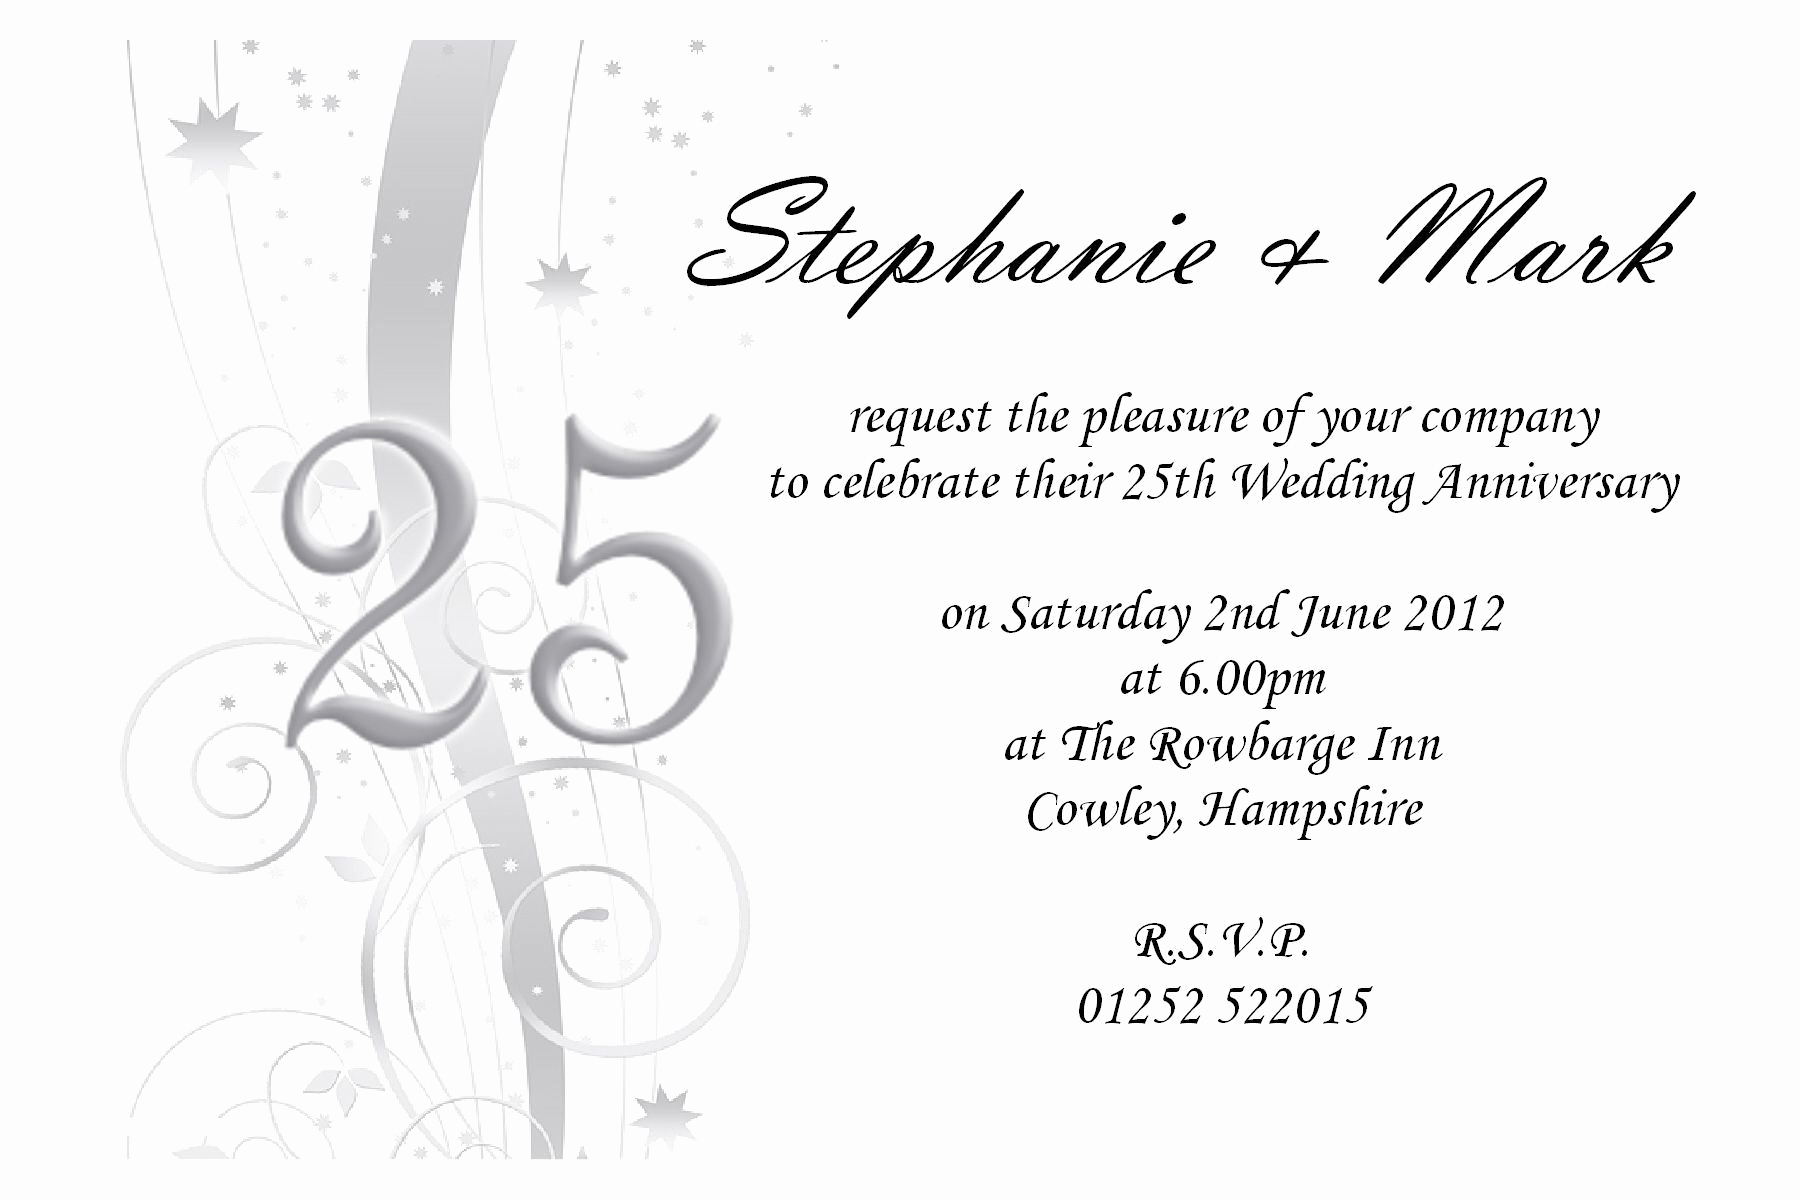 Wedding Anniversary Invitation Wording Fresh Free 25th Wedding Anniversary Invitations Free Online